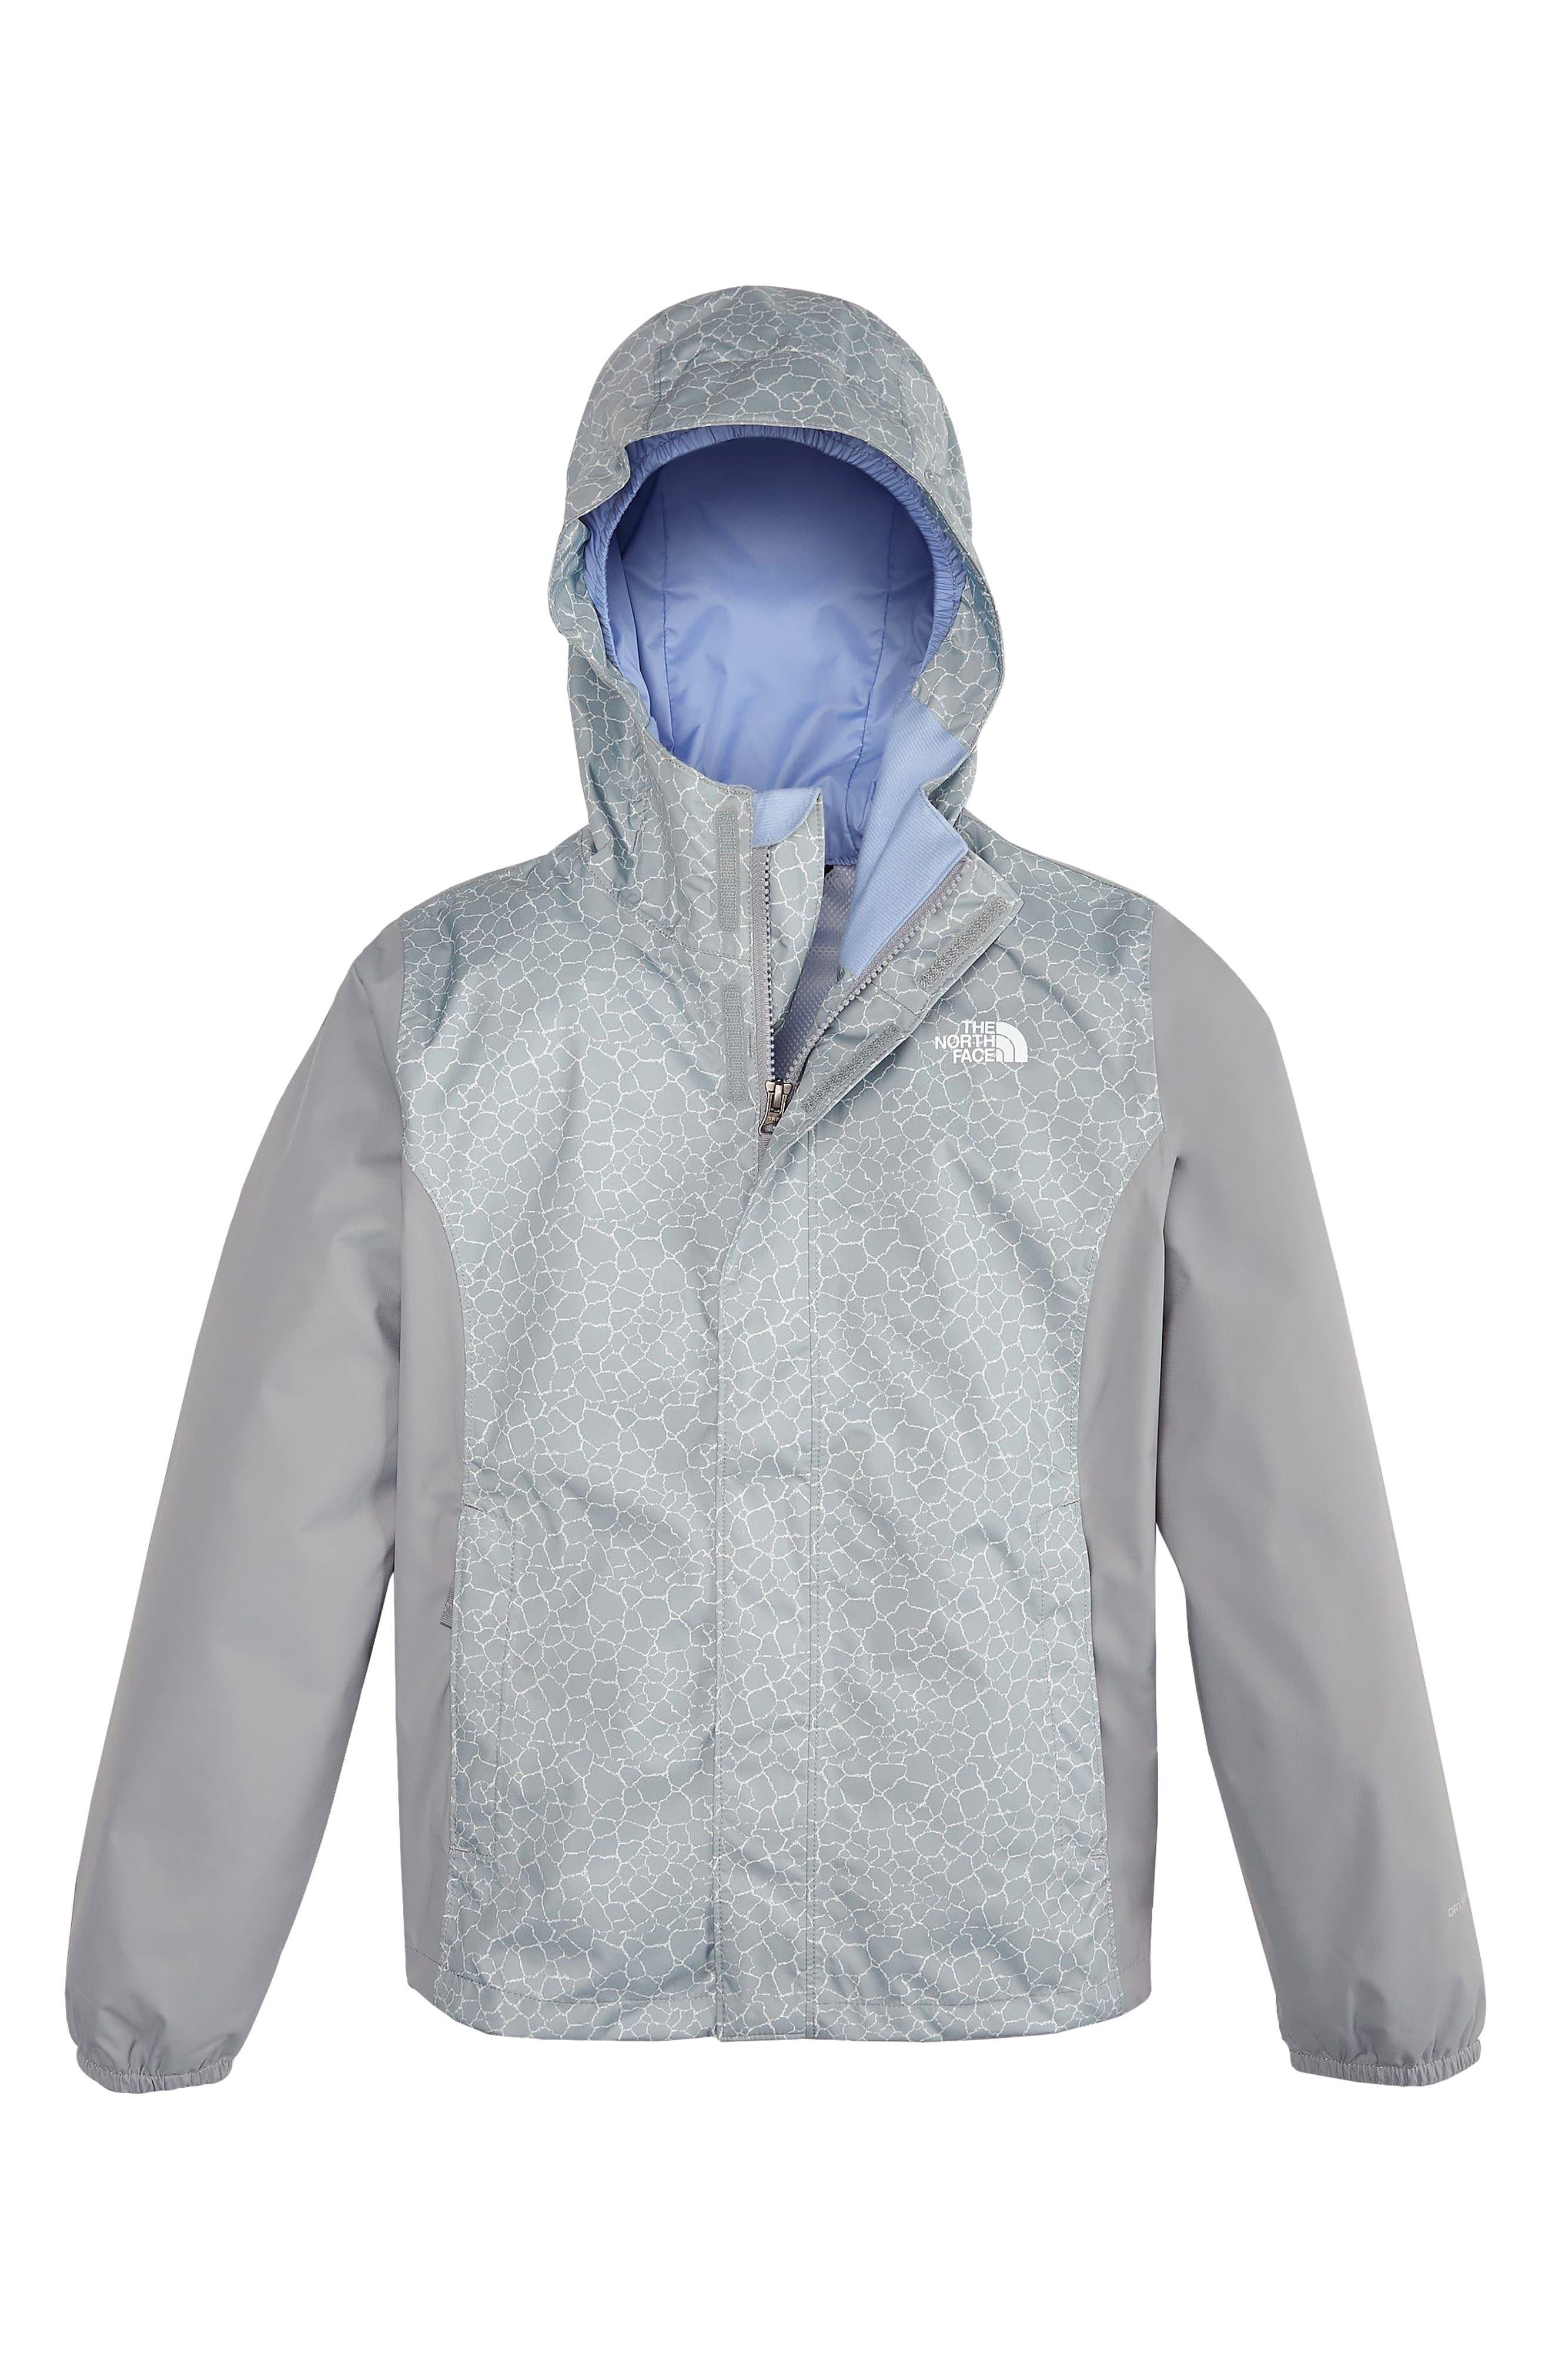 Resolve Reflective Waterproof Hooded Jacket,                         Main,                         color, Mid Grey Crackle Print